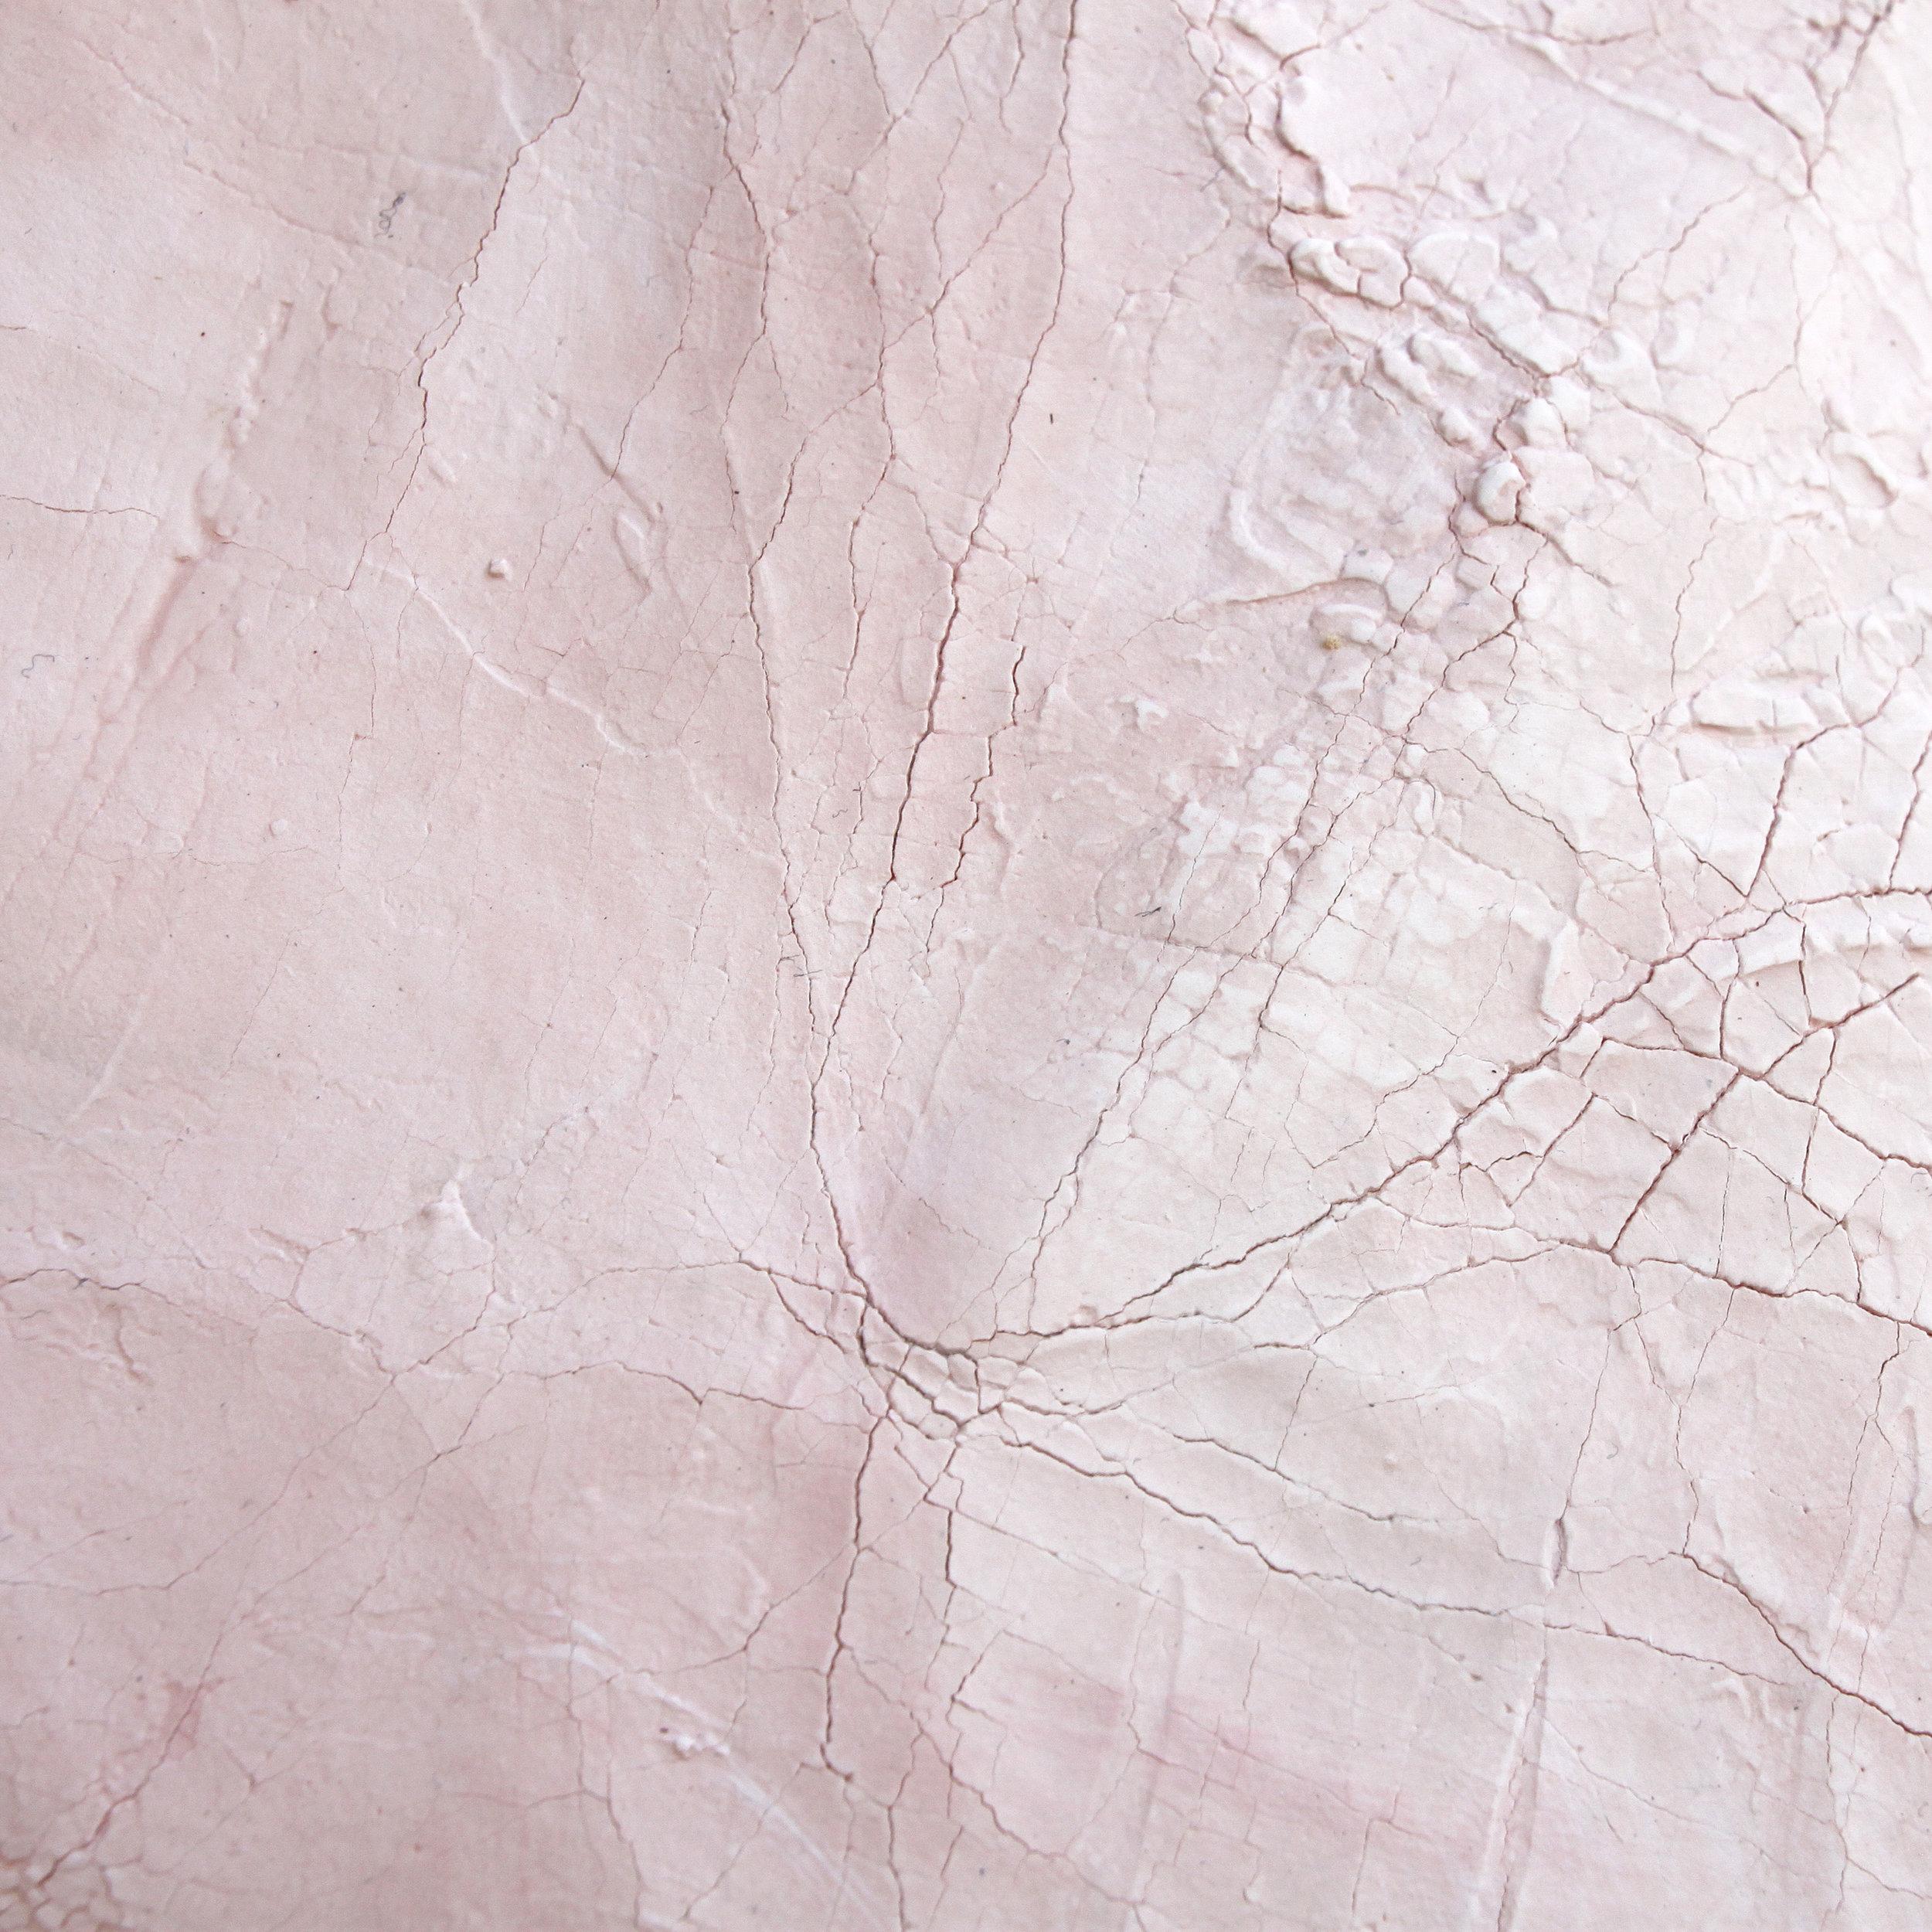 blush stying surface #1 flatlay prop for stylists wedding photographer.jpg